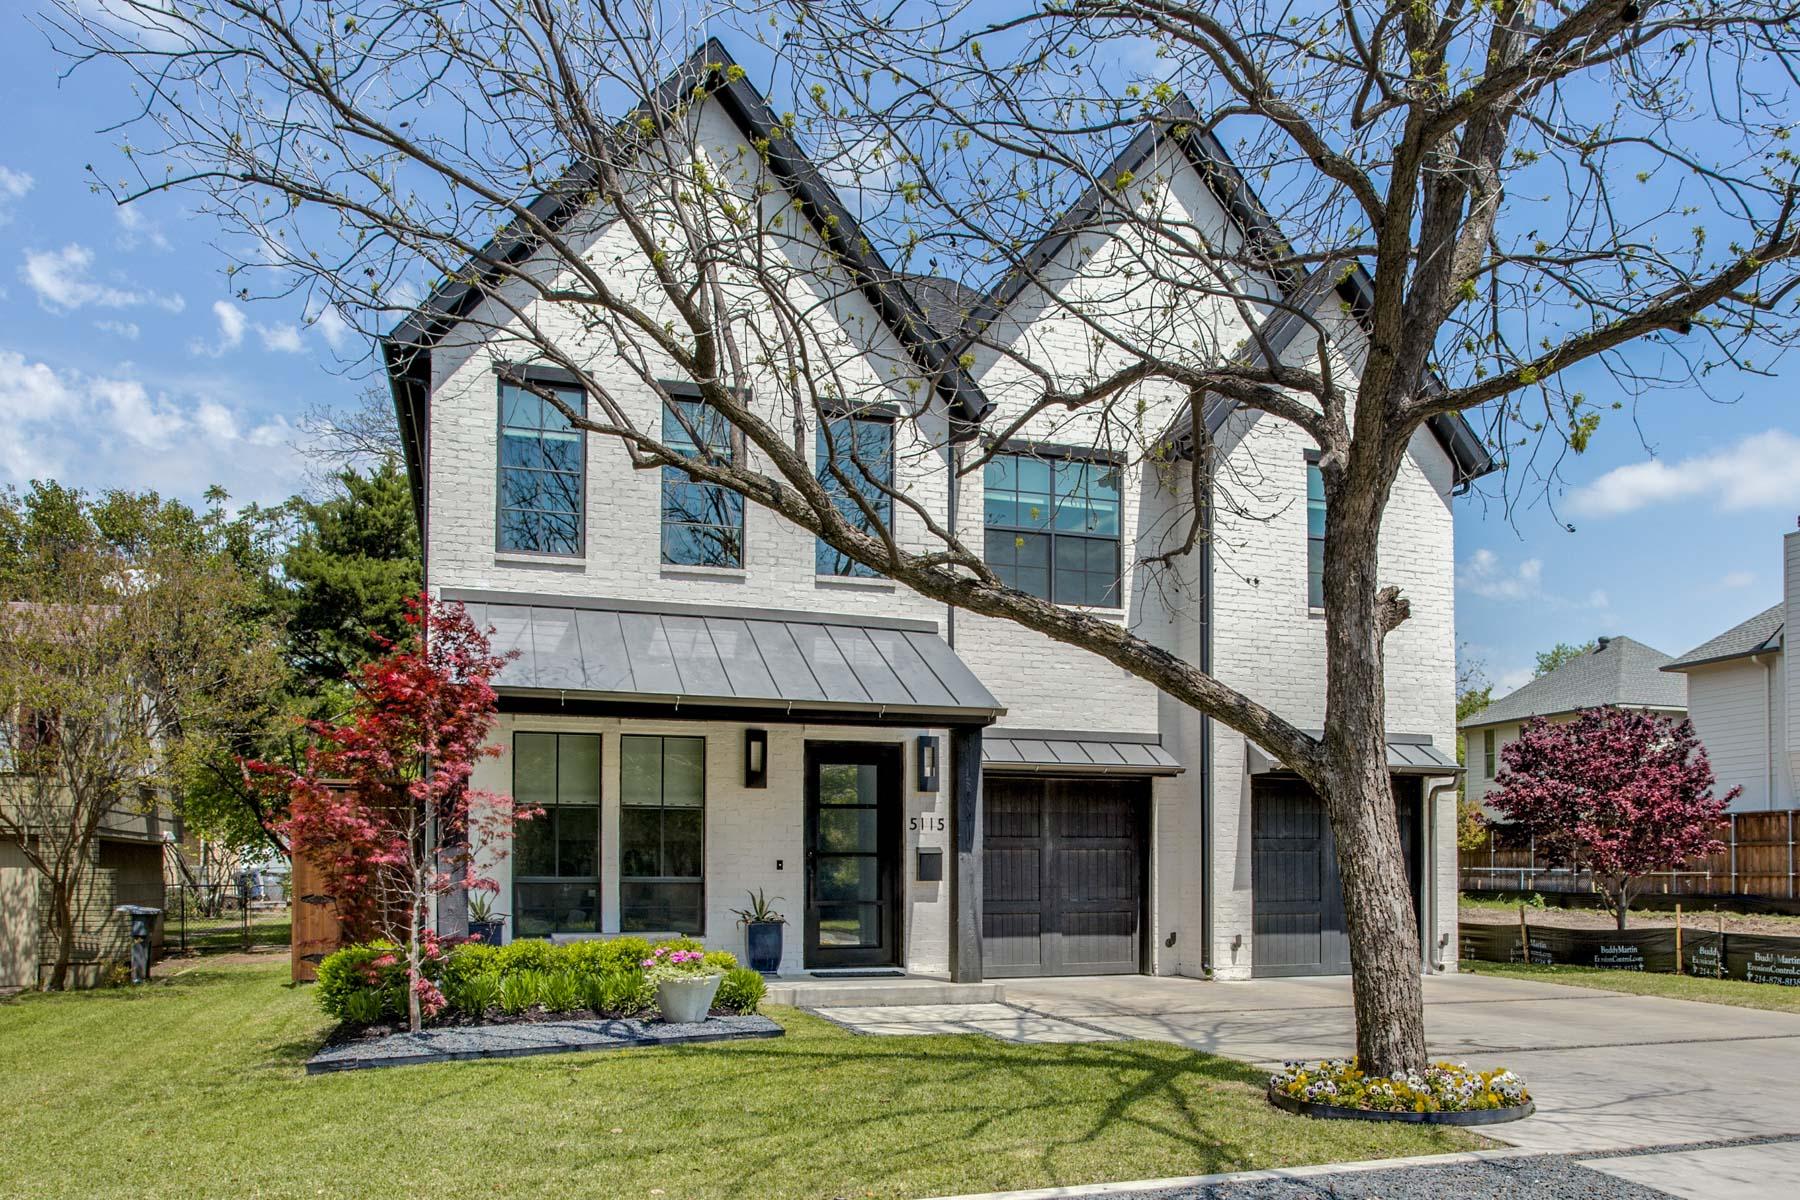 Single Family Home for Sale at 5115 W. Hanover Avenue Dallas, Texas, 75209 United States